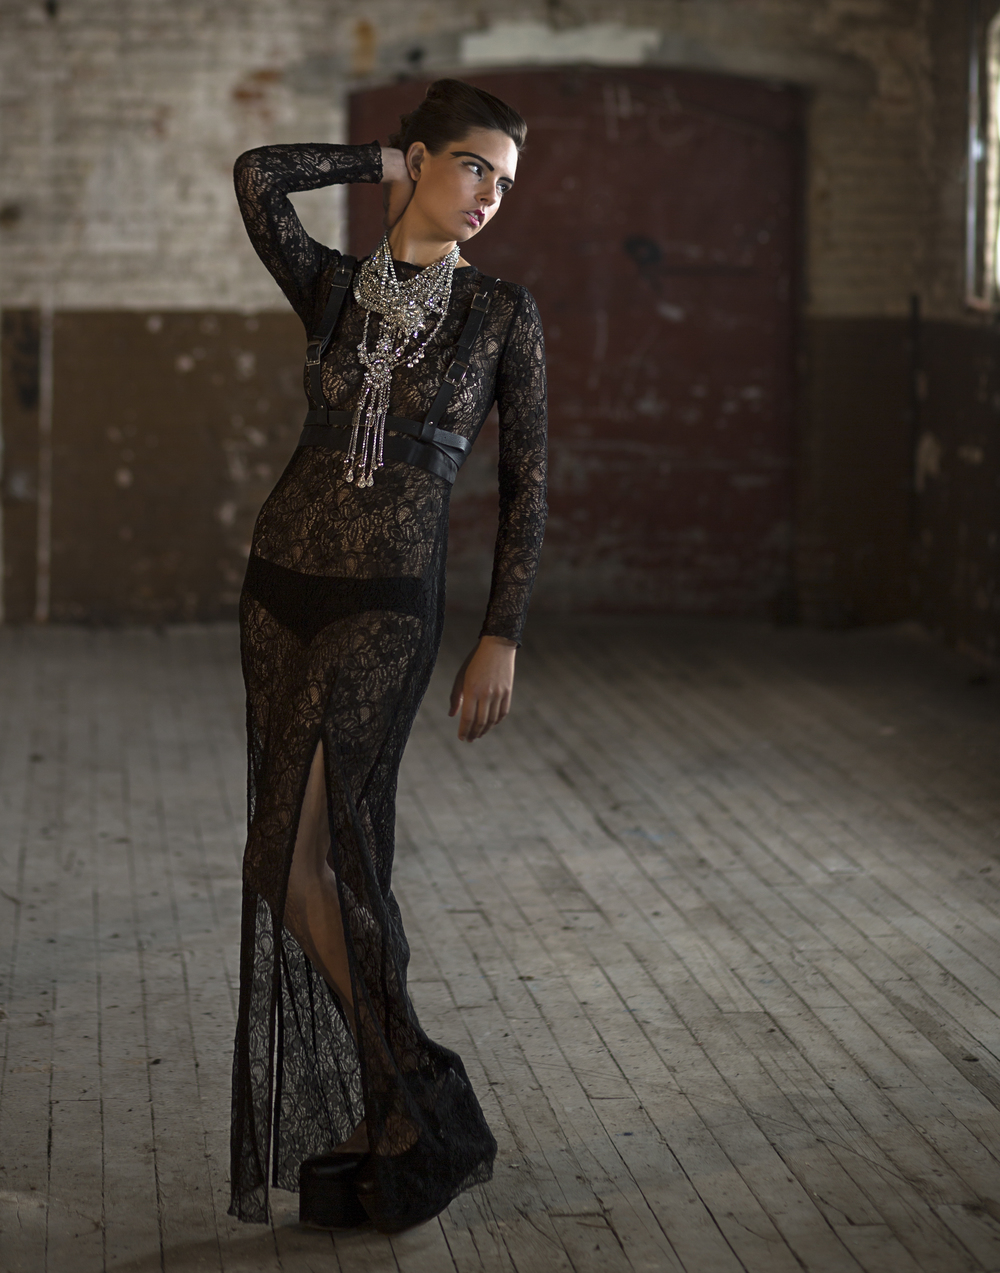 Missy Davis Brooklyn NYC photography.jpg-10.jpg